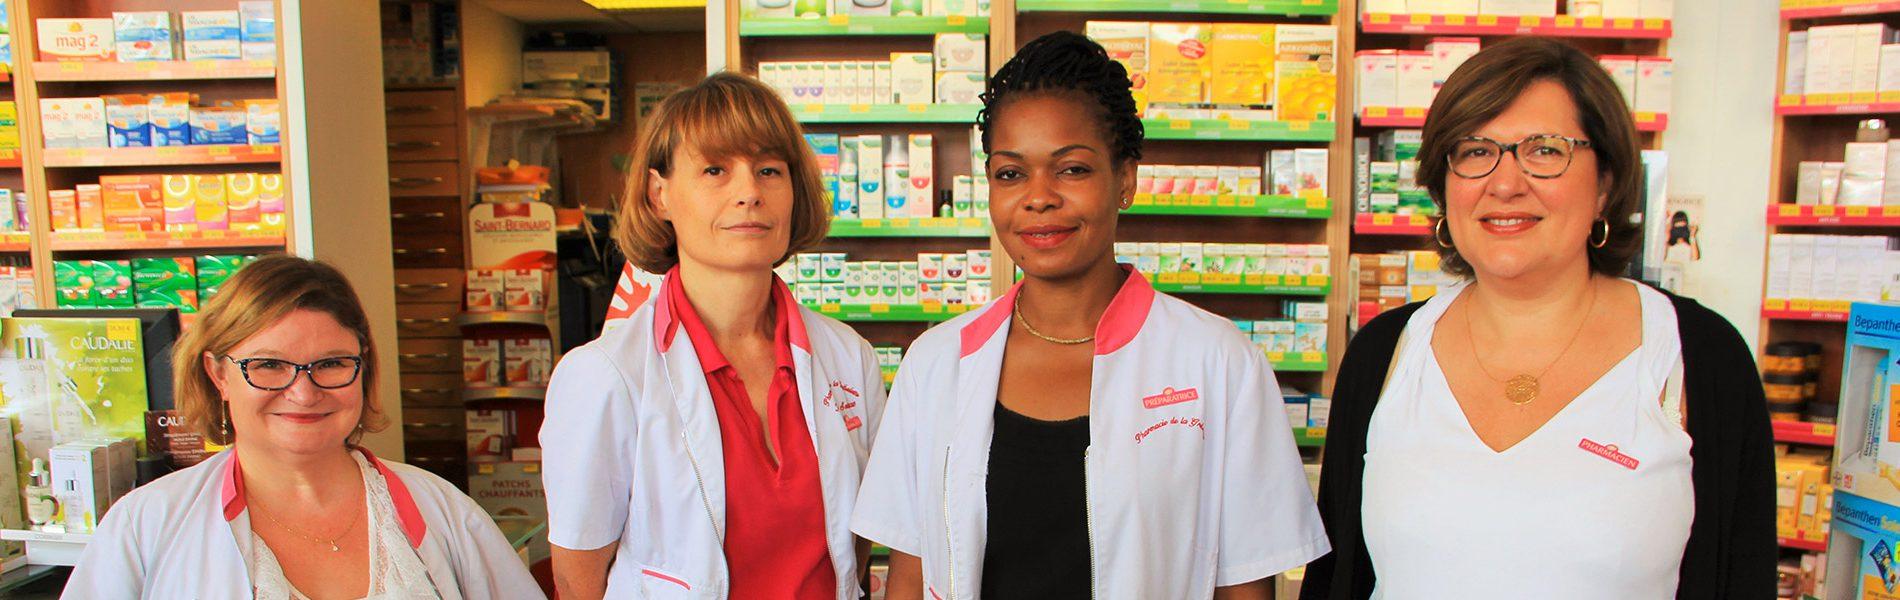 Pharmacie DE LA GRIBELETTE - Image Homepage 4